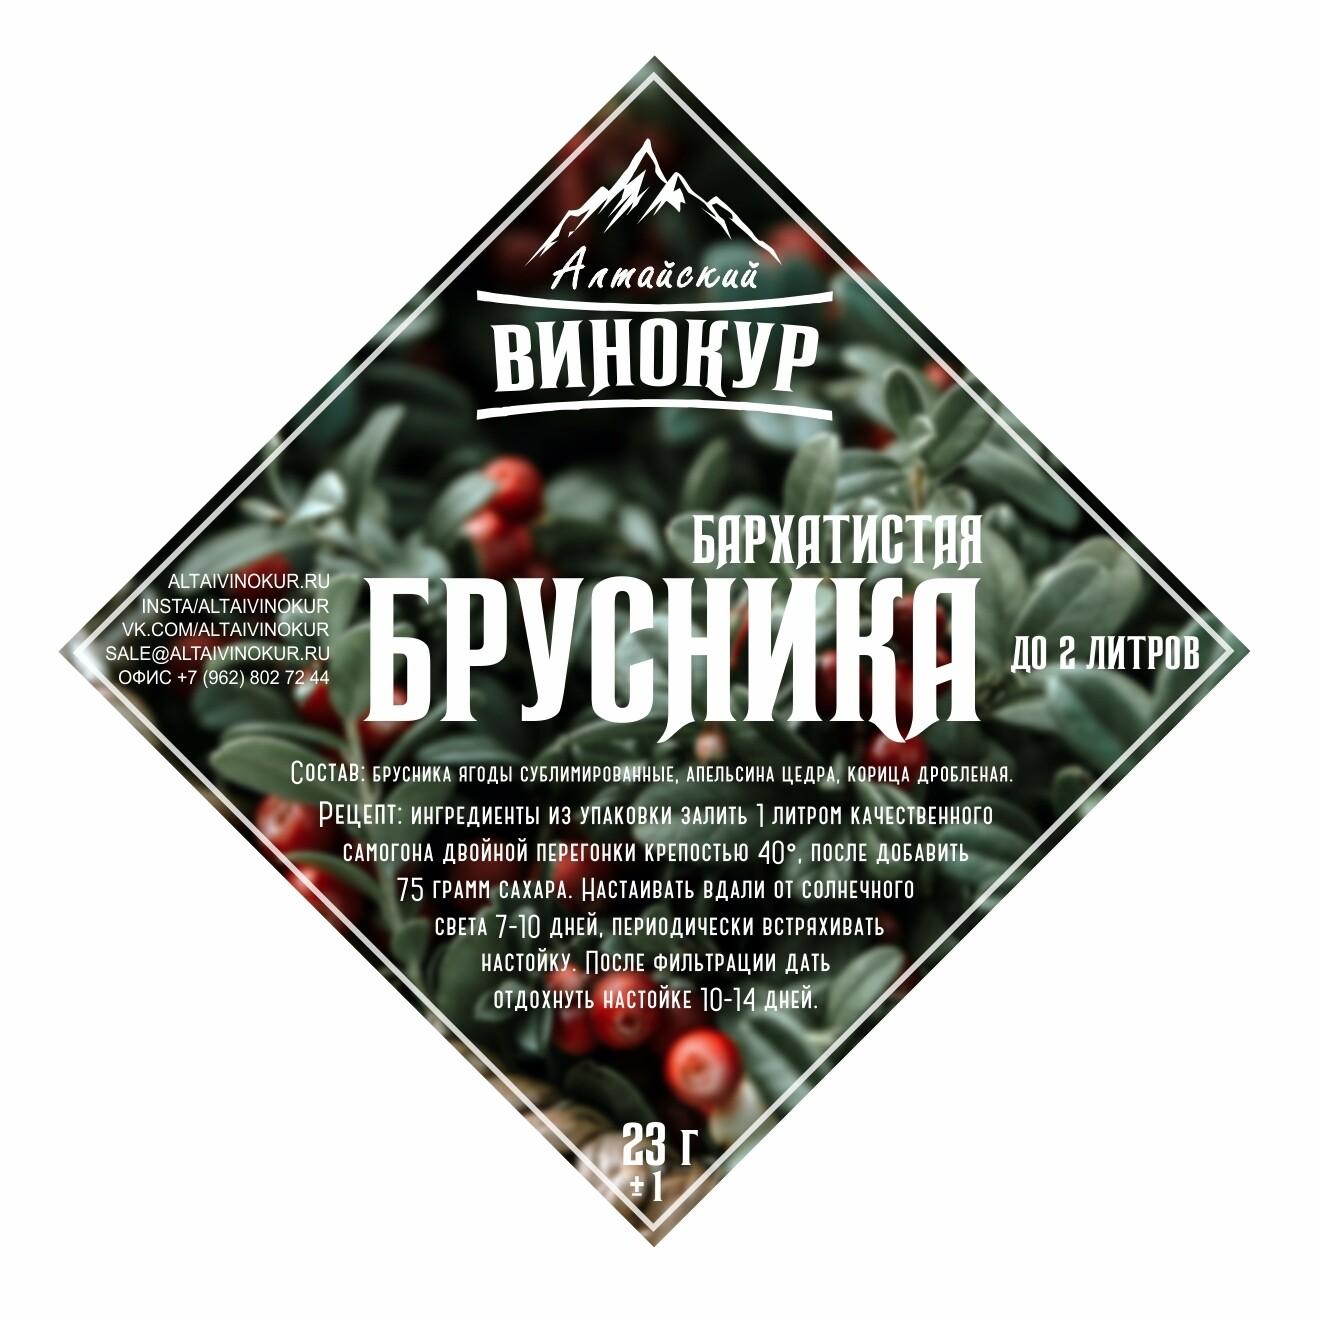 Бархатистая Брусника | Набор трав и пряностей